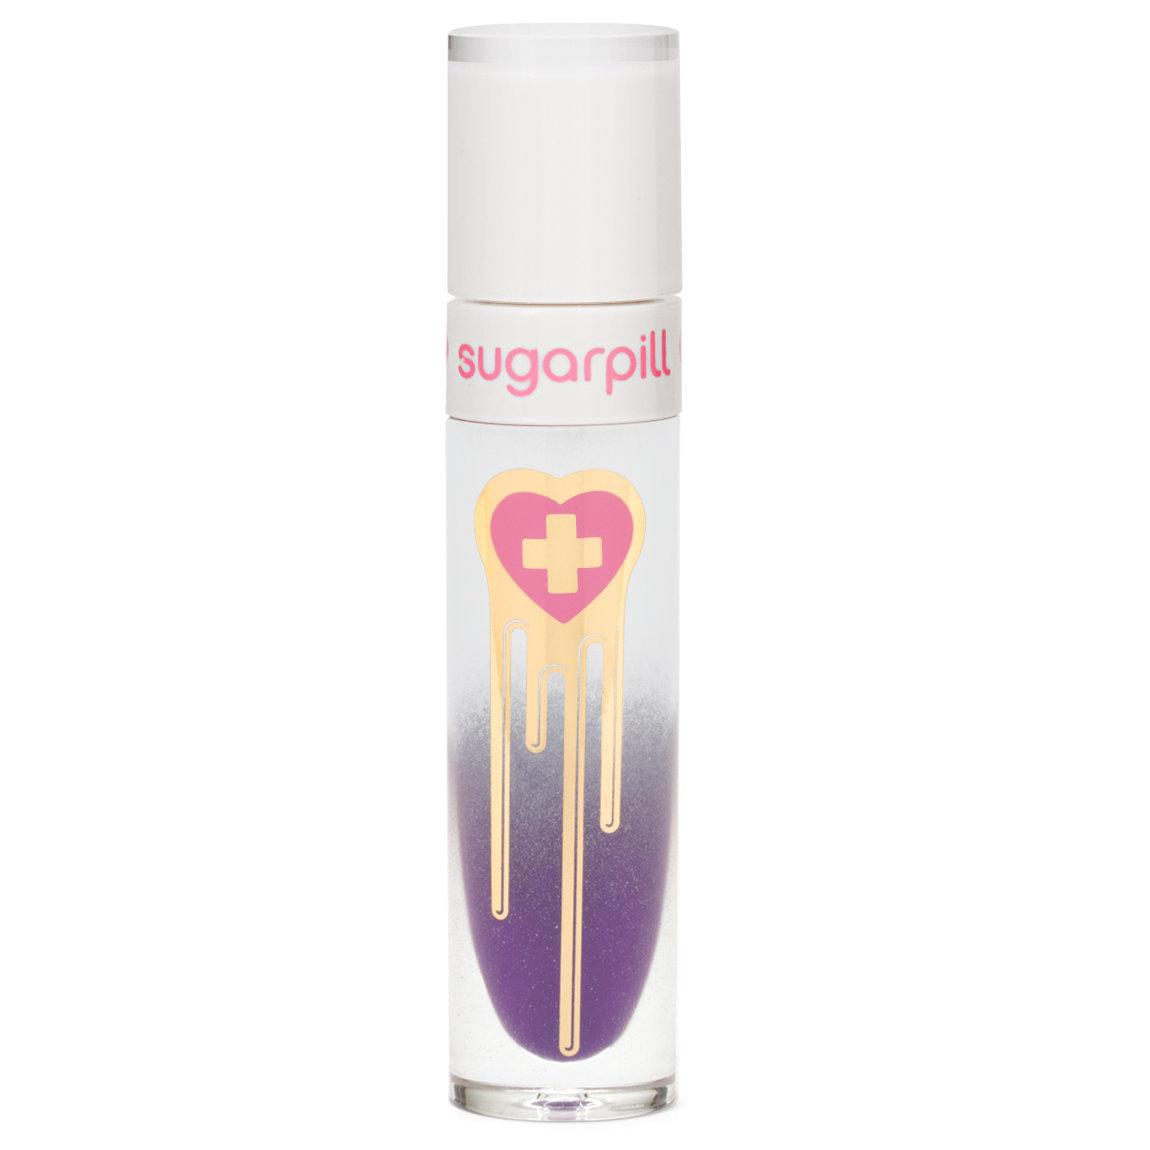 Sugarpill Cosmetics Liquid Lip Color Spank